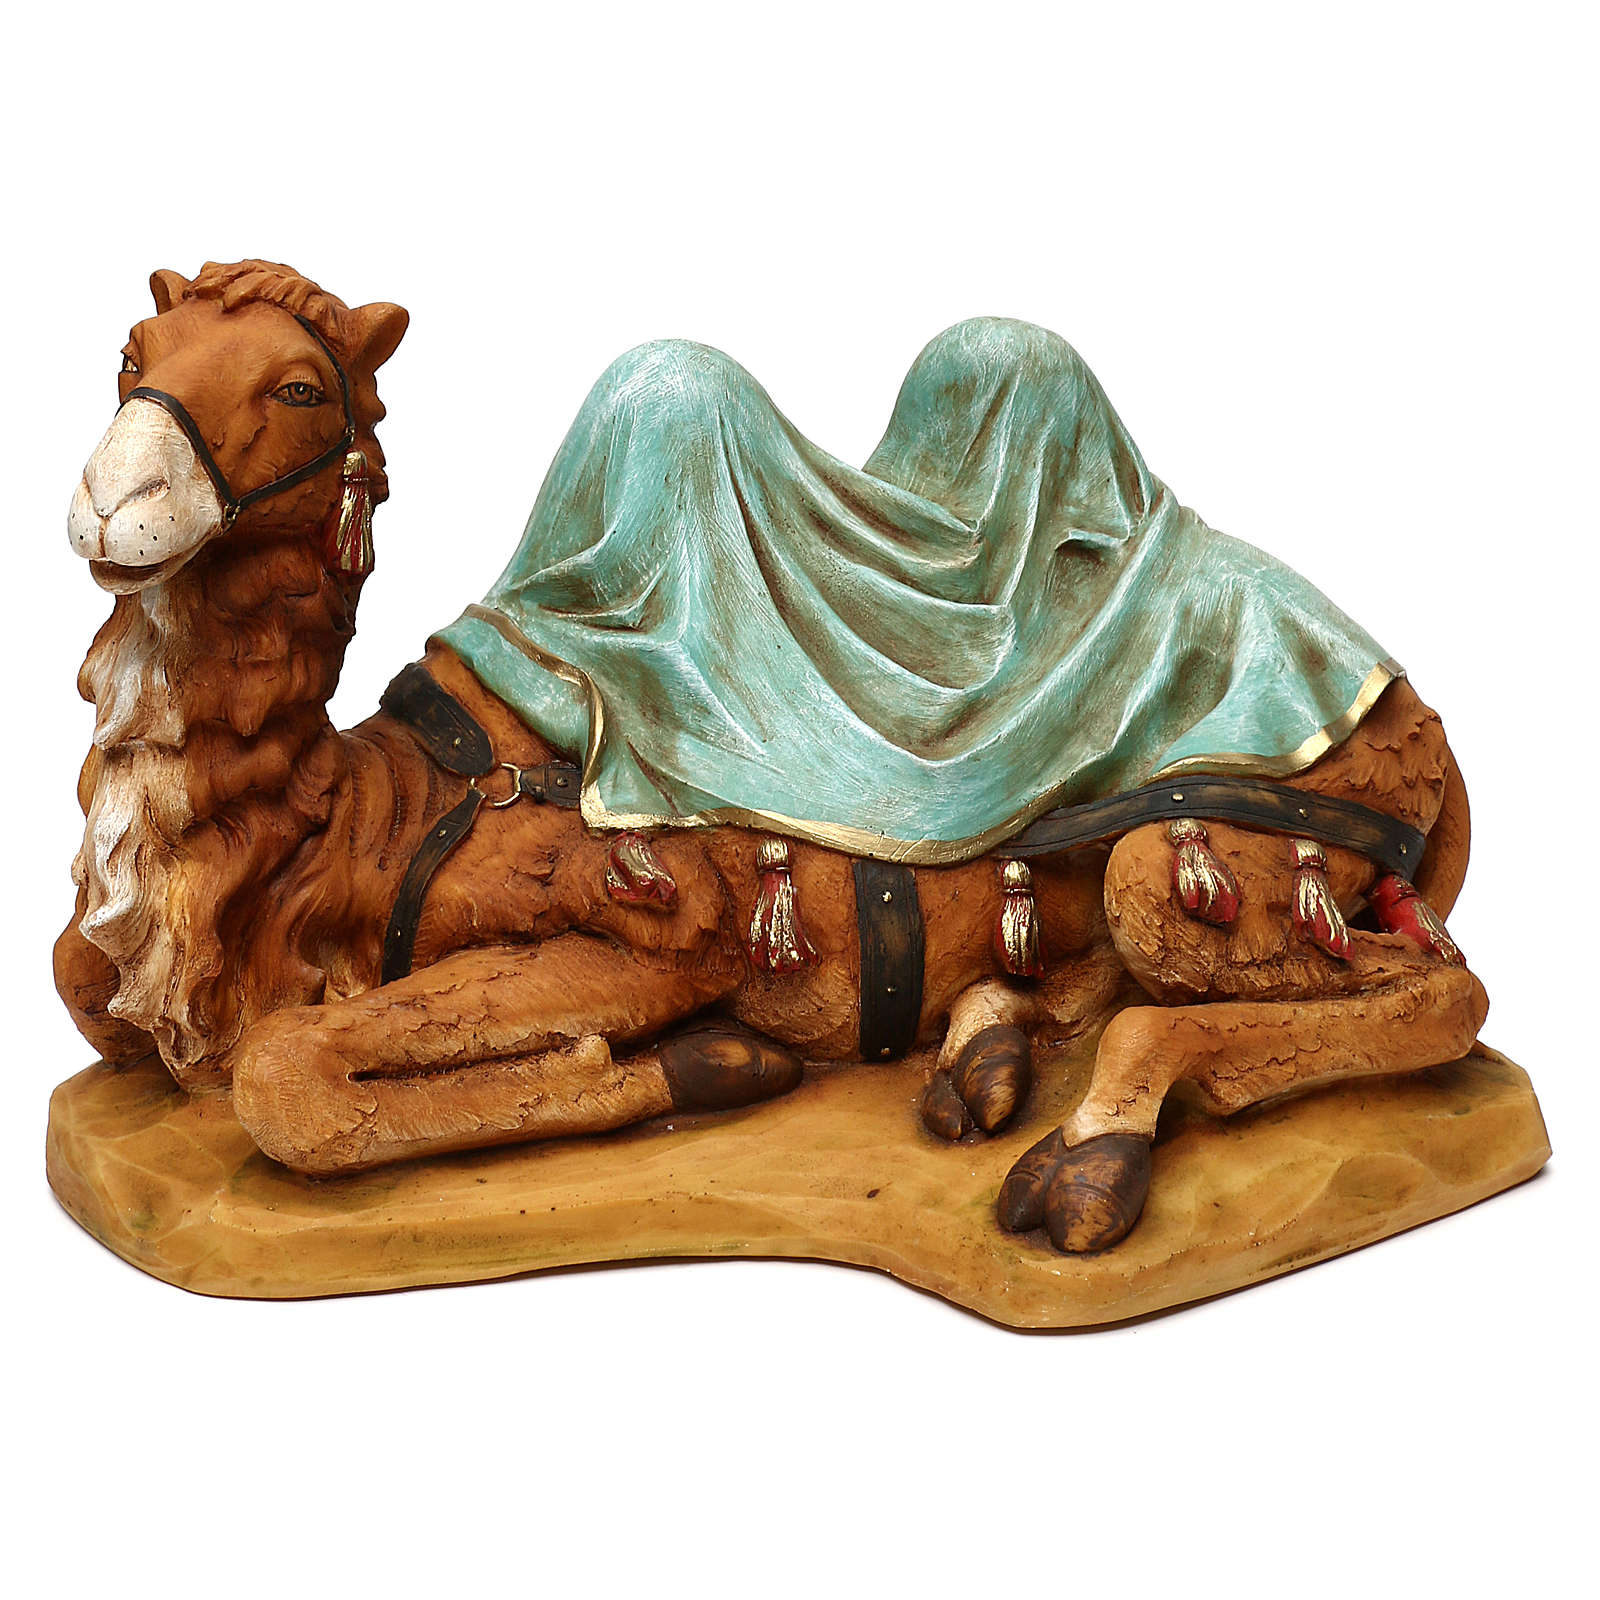 STOCK Cammello seduto per presepe 52 cm in resina Fontanini 4